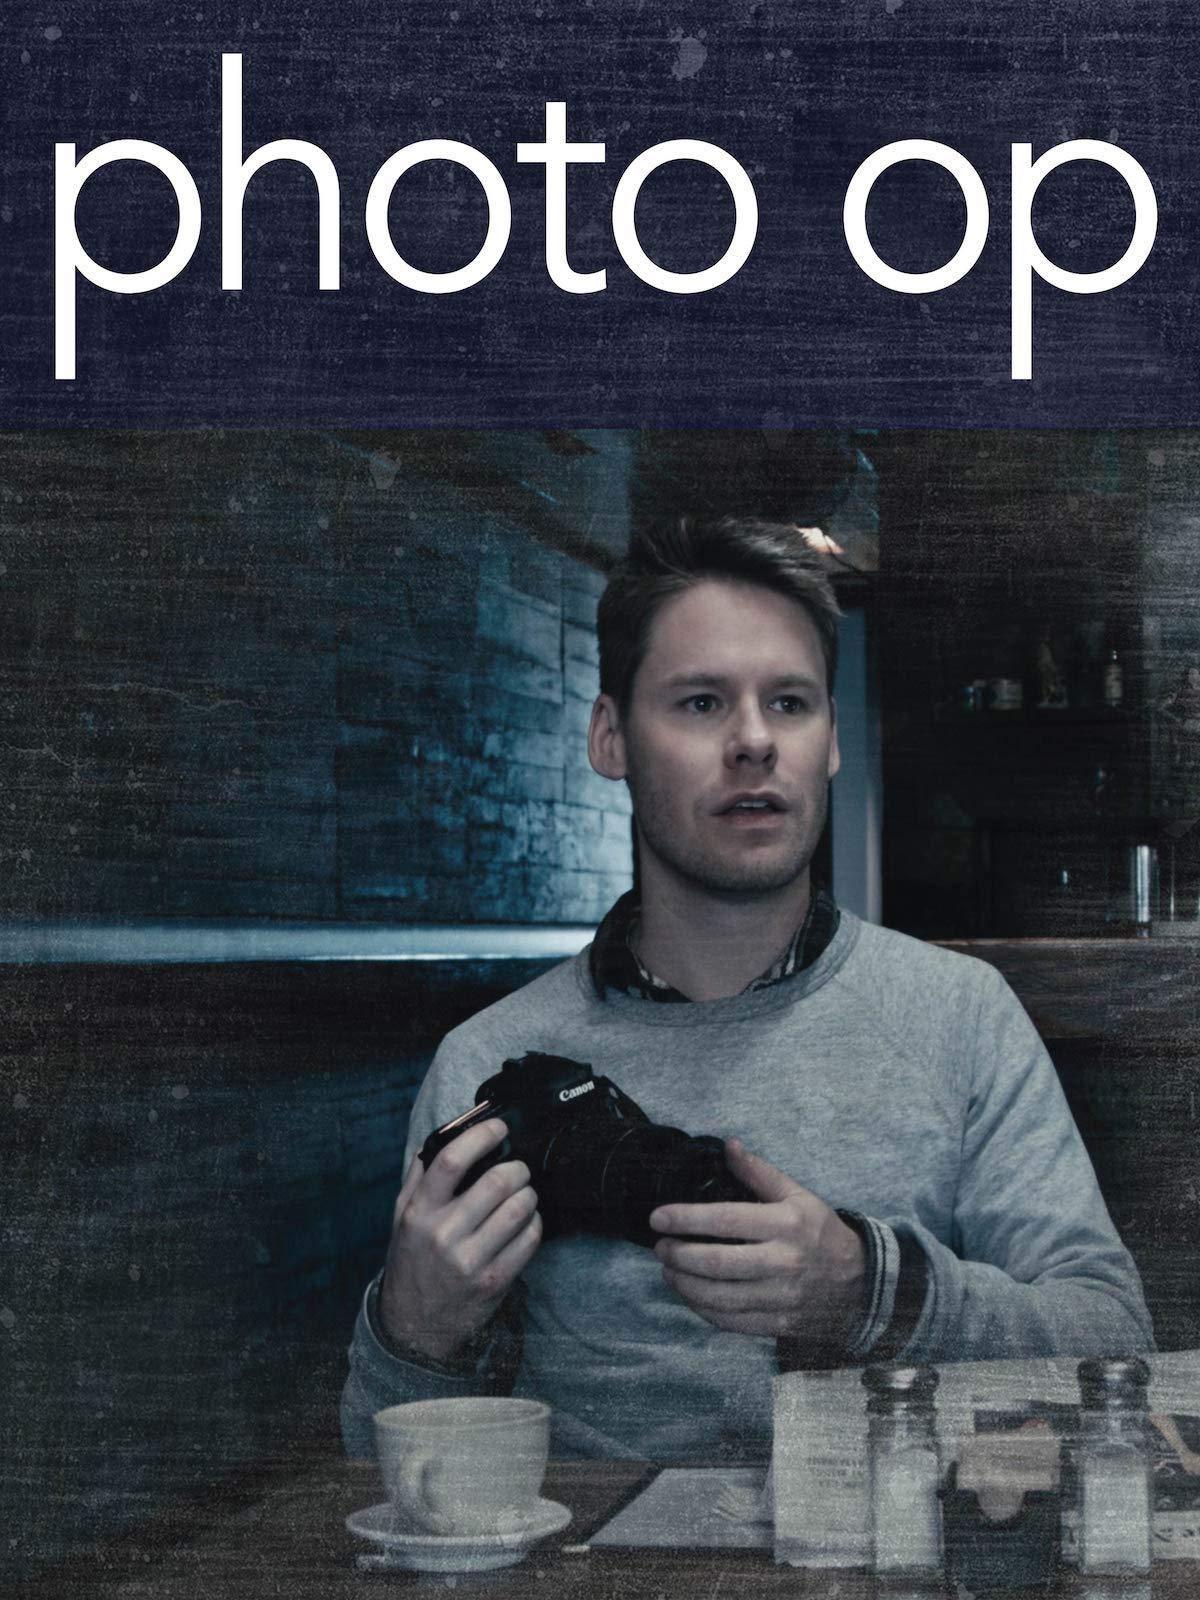 Photo Op on Amazon Prime Video UK